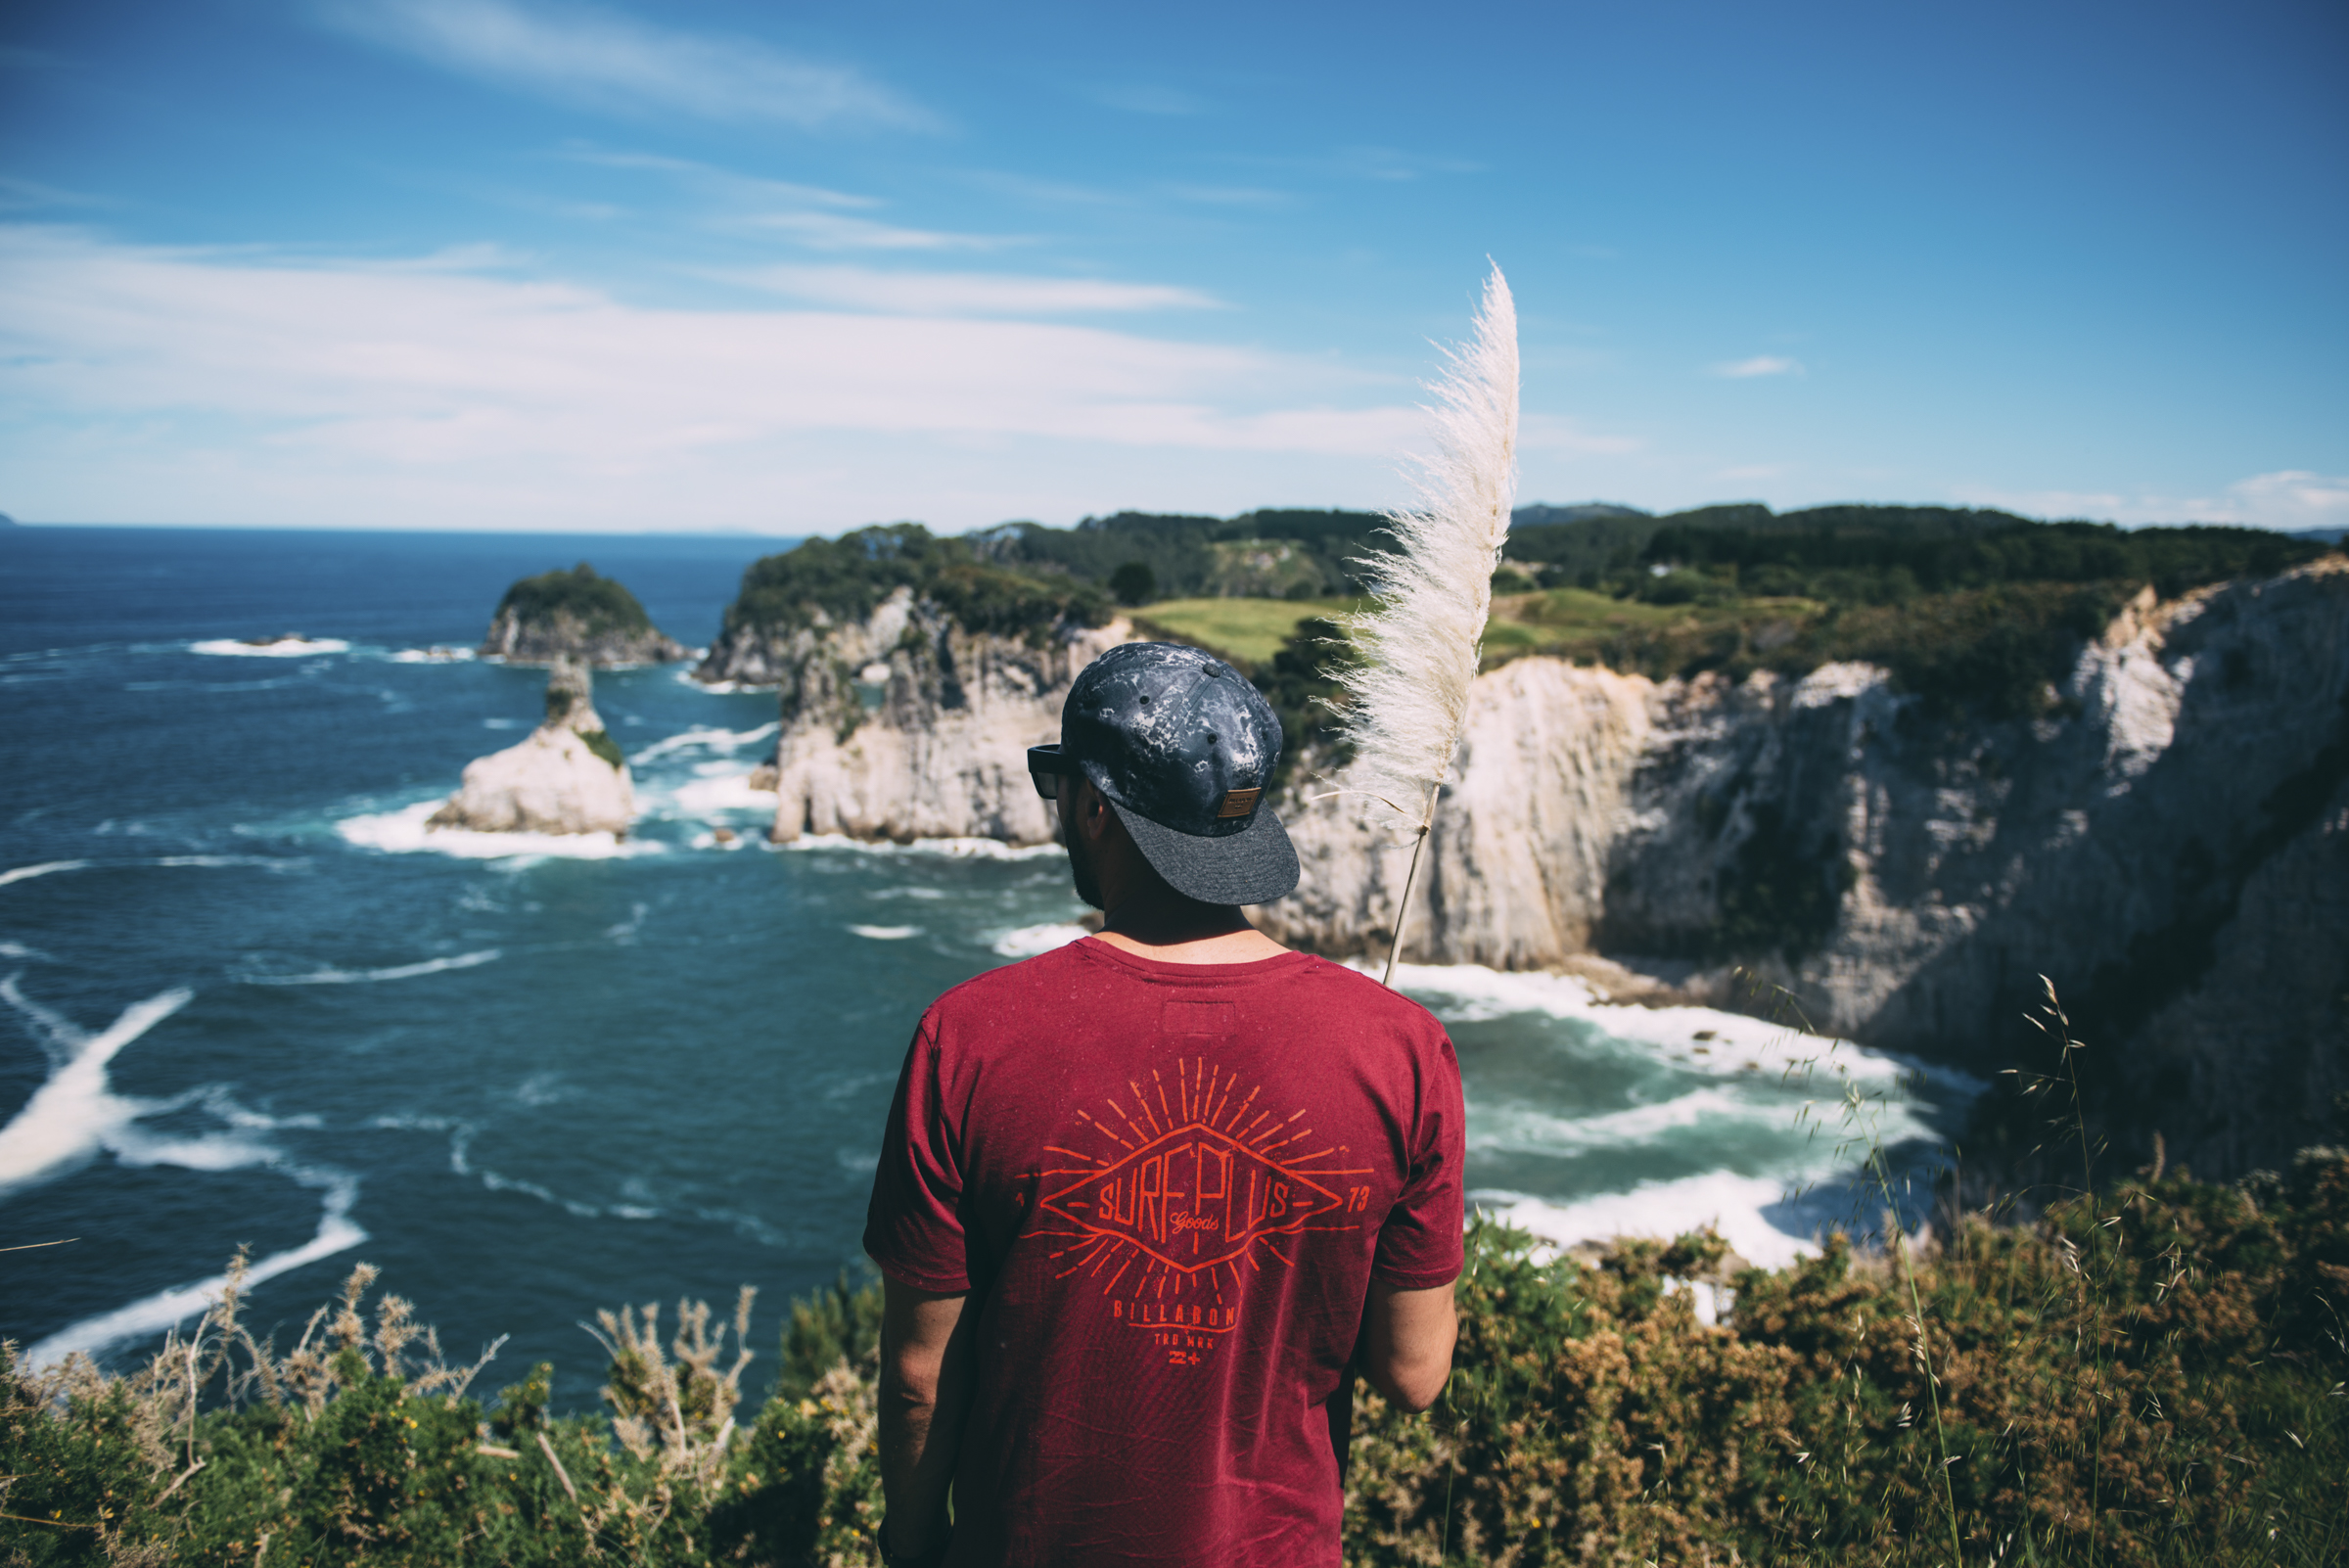 New Zealand Road Trip Lola Photography WEB_011.jpg